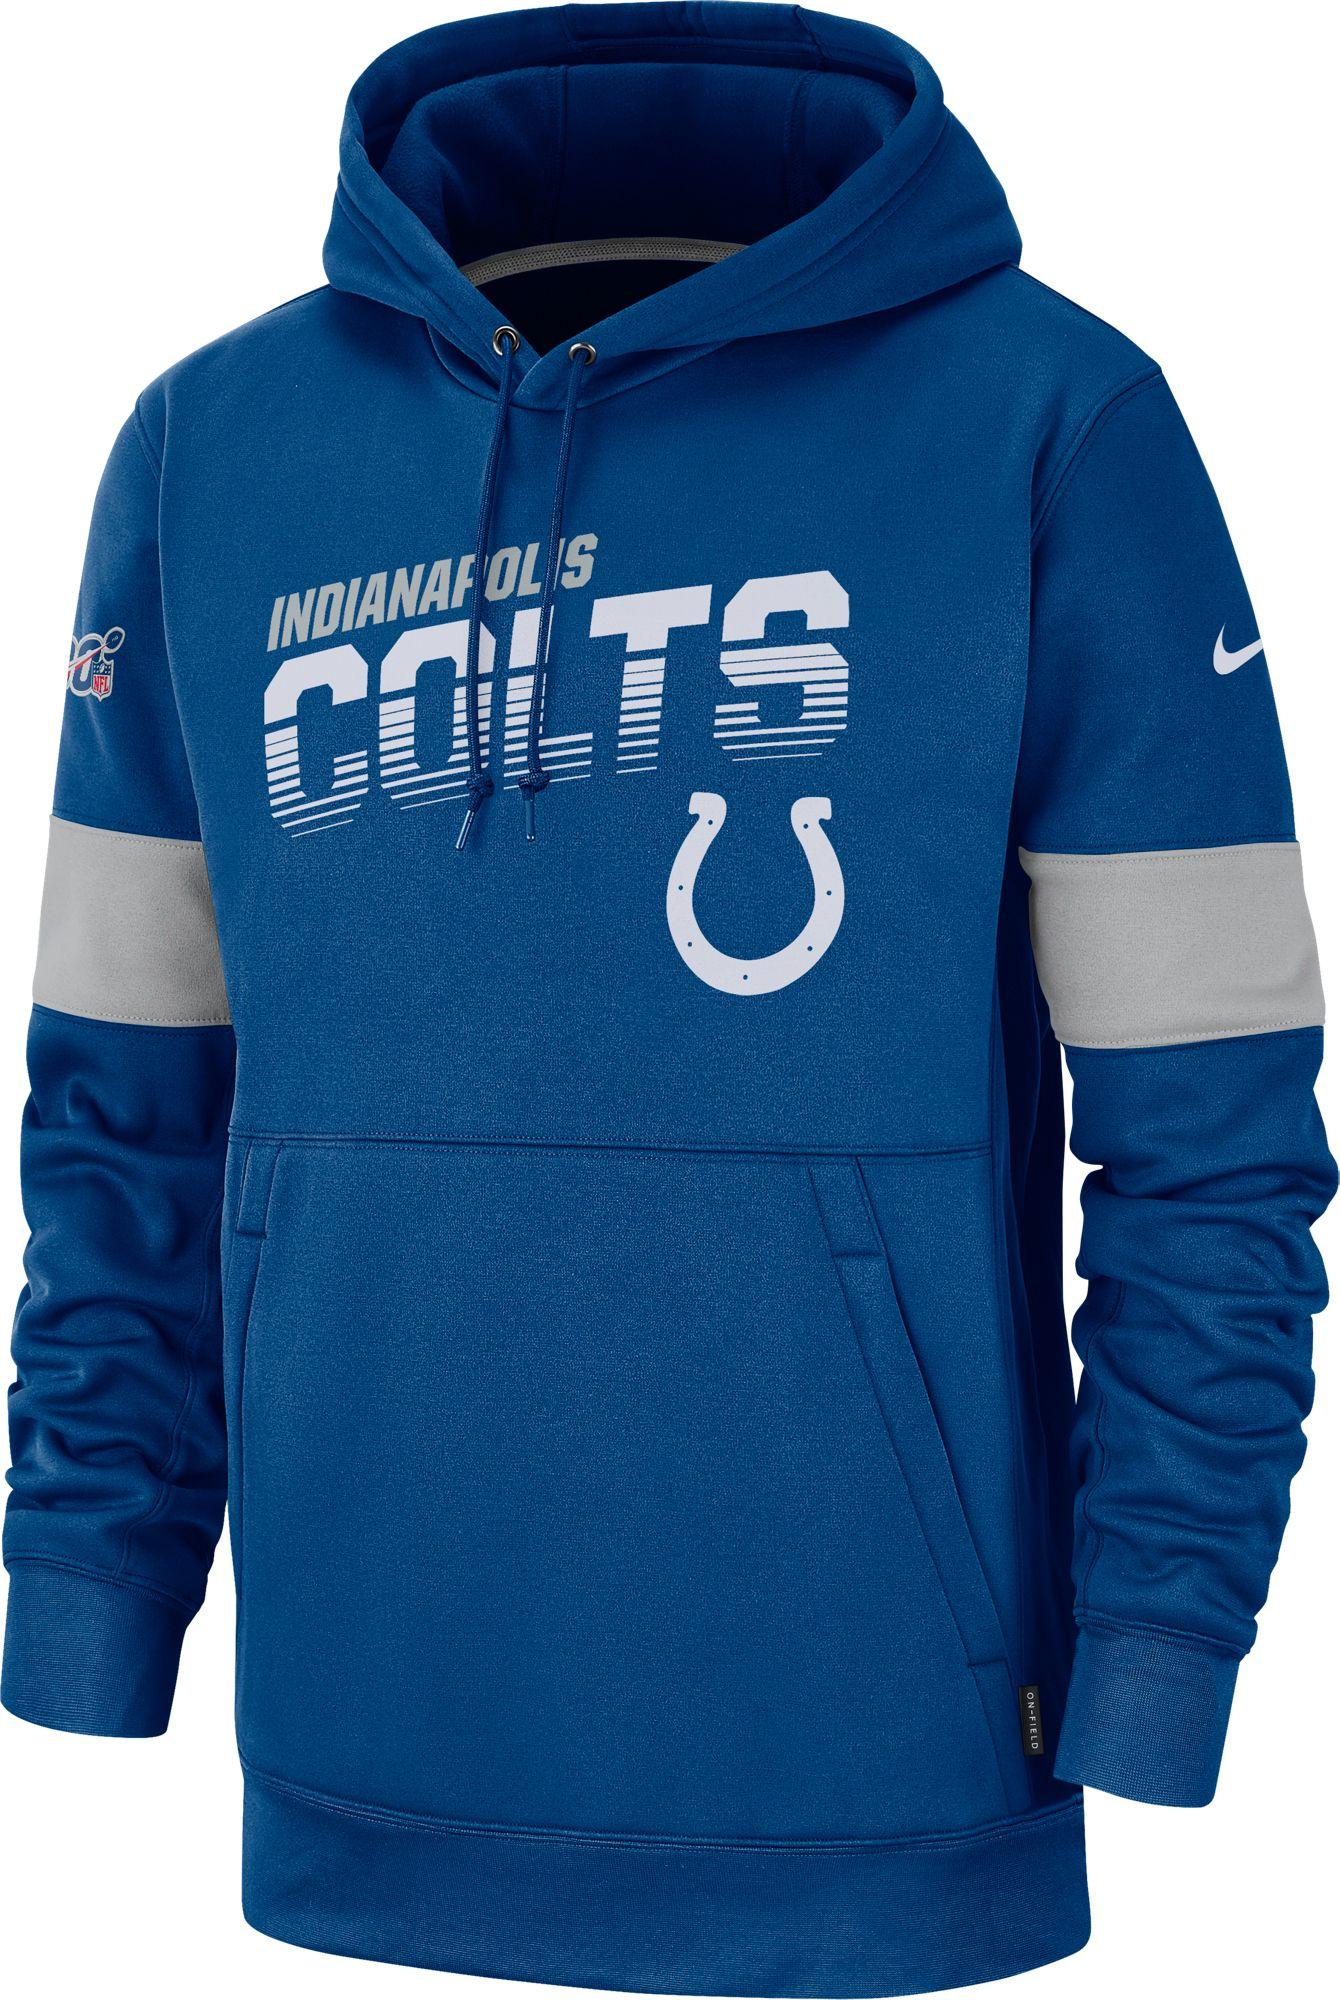 colts sweatshirt